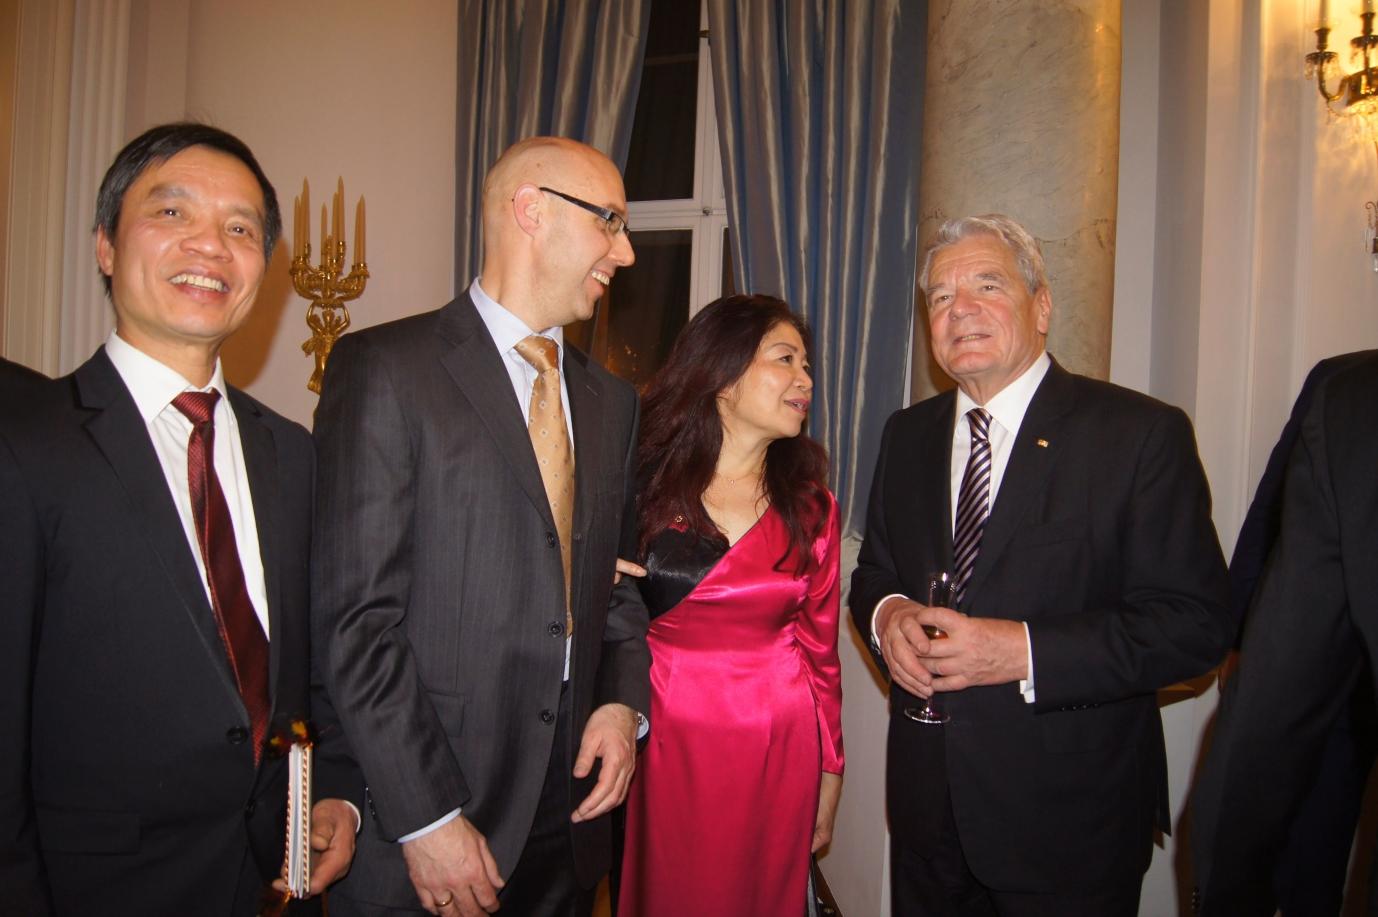 v.l.n.r. Mai-Phuong Kollath (3.), Bundespäsident Joachim Gauk (4.)